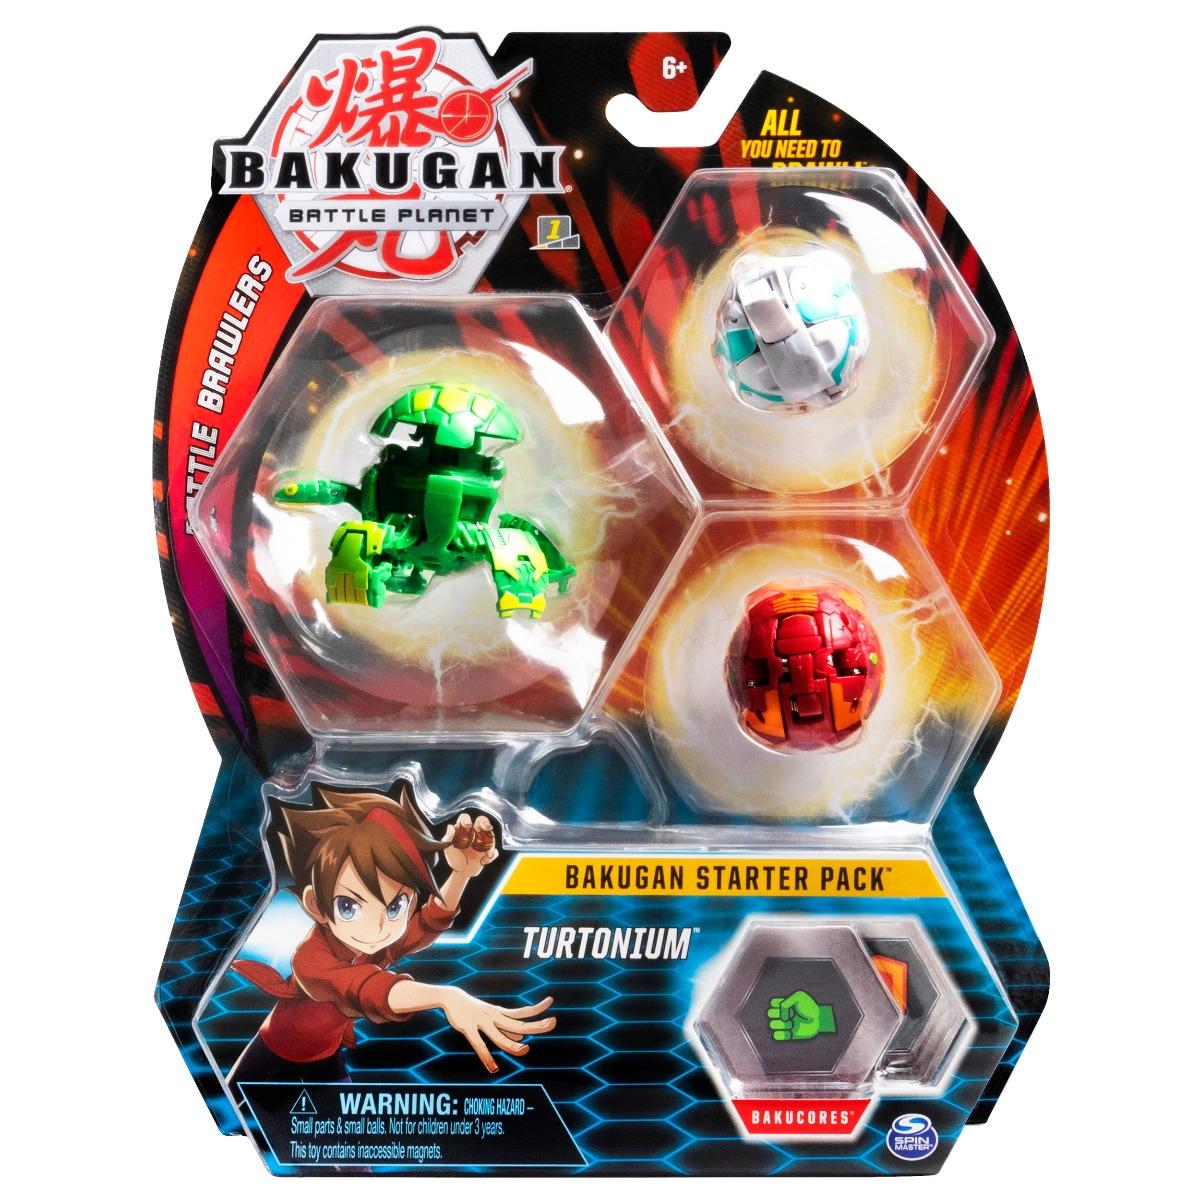 Set Bakugan Battle Planet Starter Pack Turtonium, 20109156